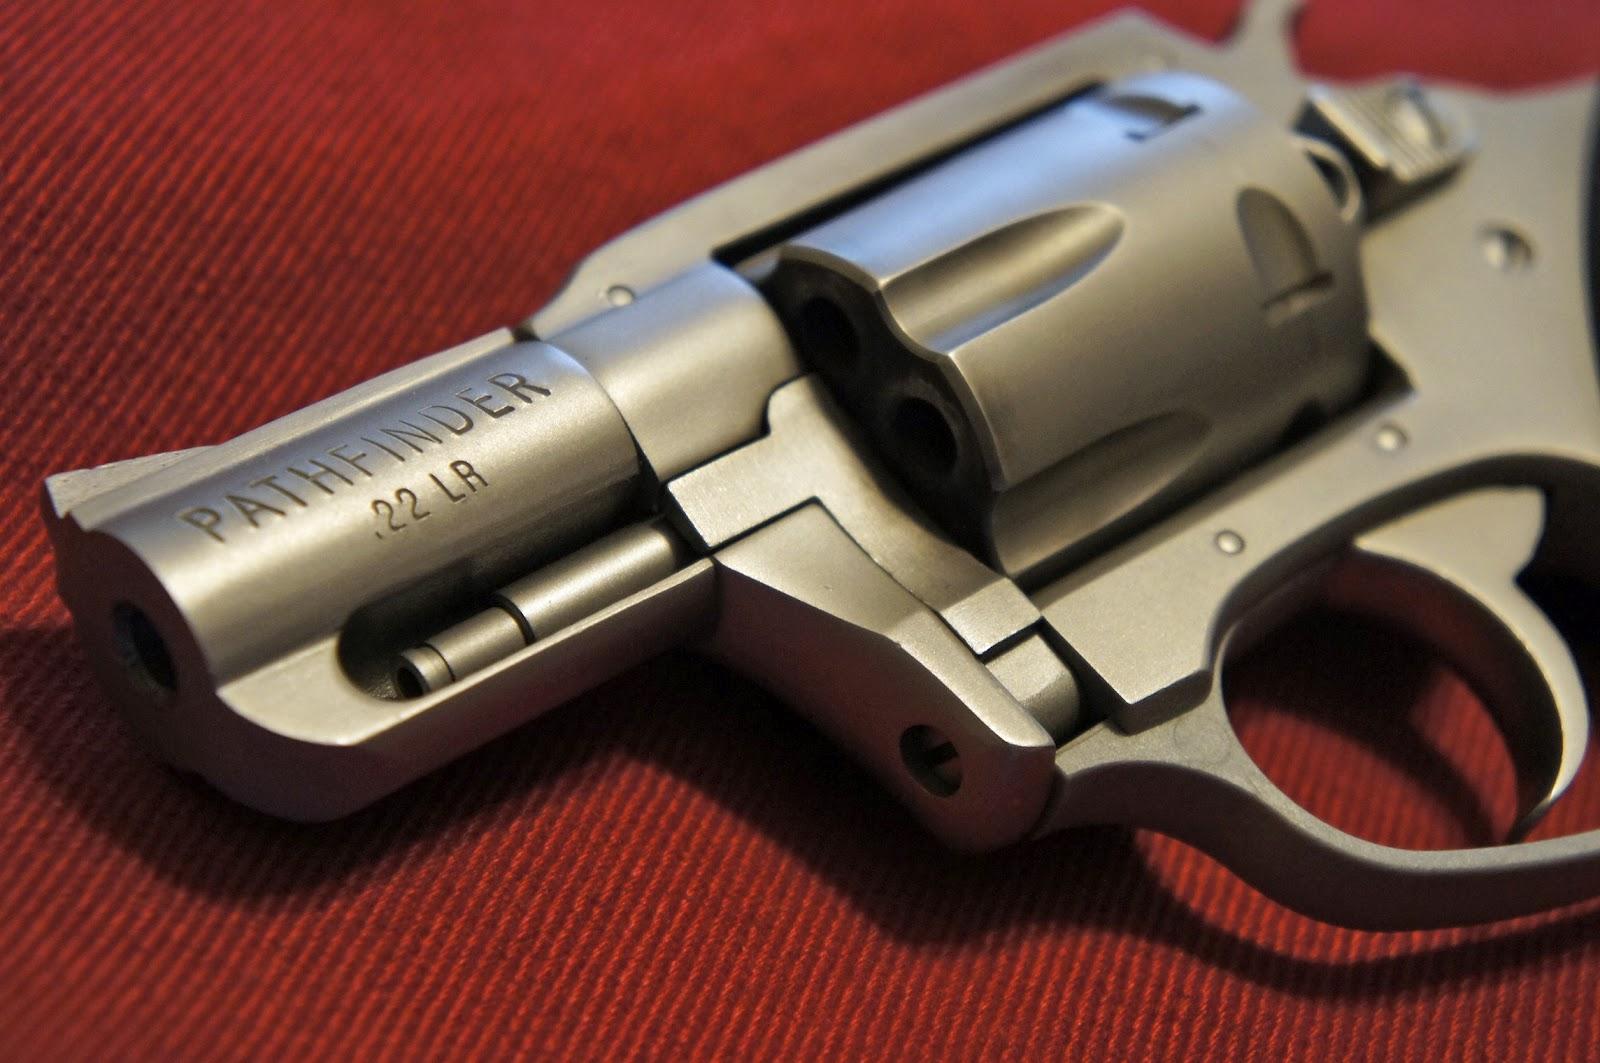 Recumbent Conspiracy Theorist: The Shooting Bench -- Charter